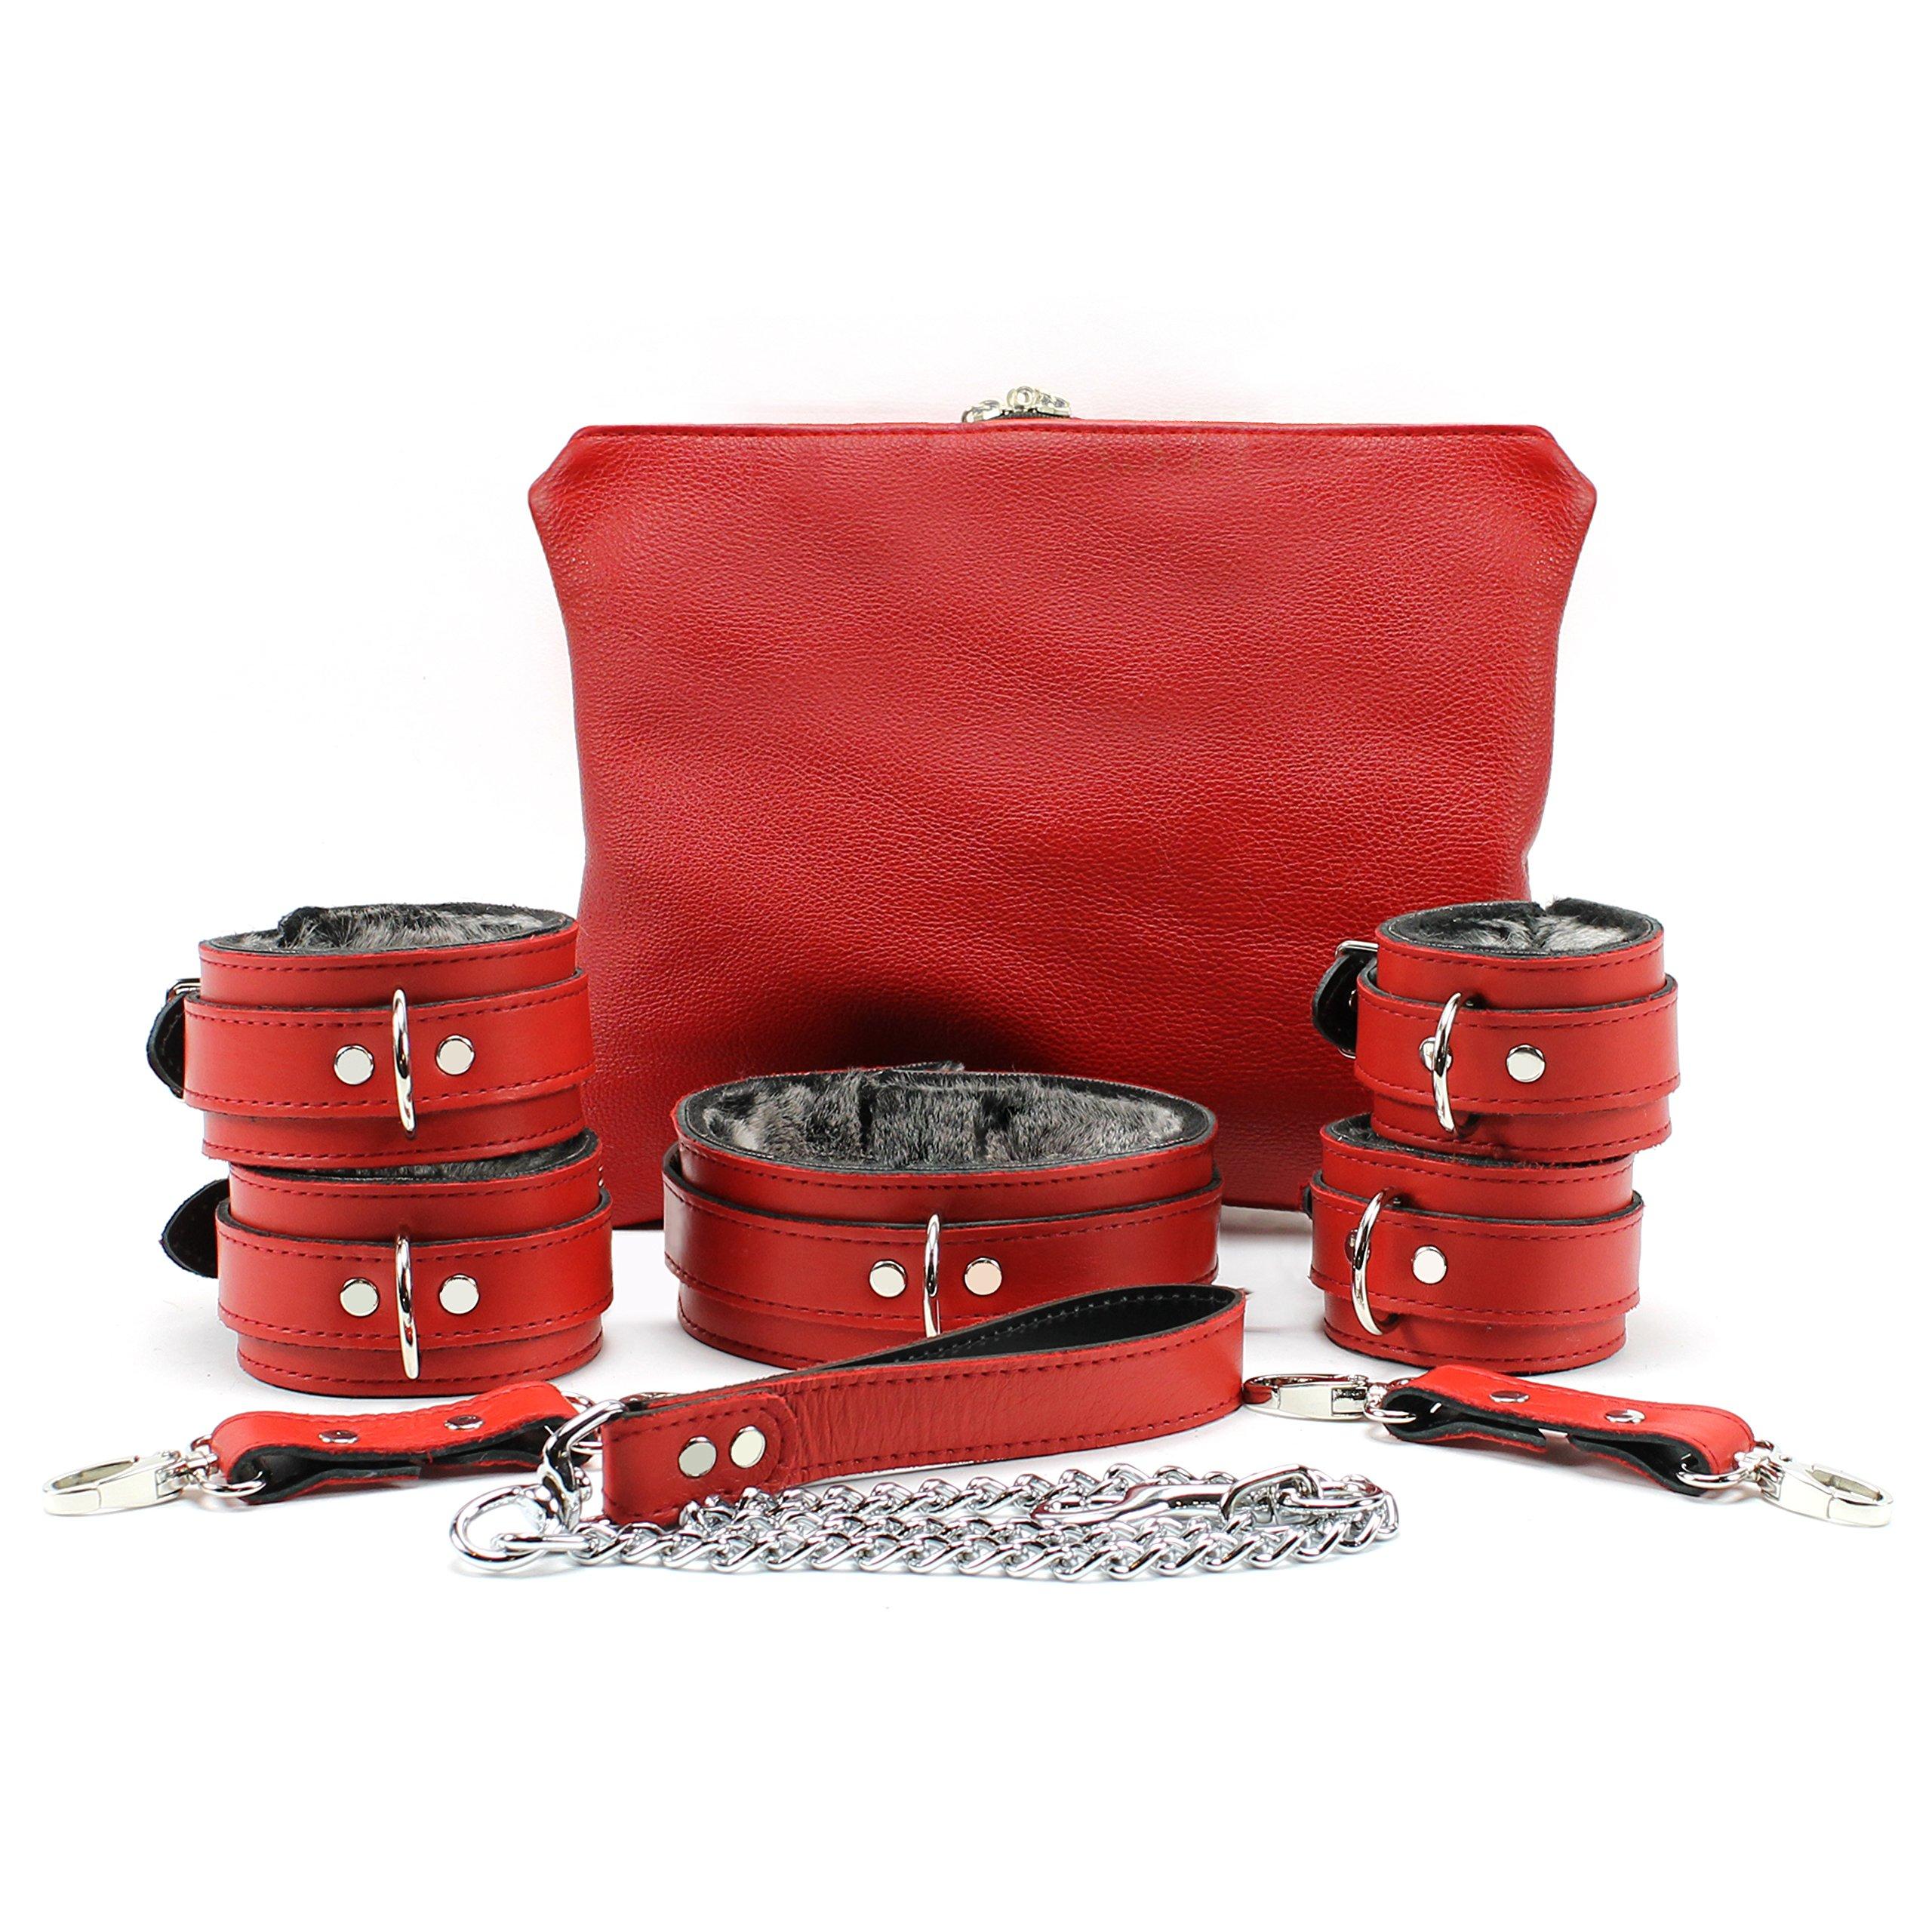 Bangkok Set Collar Wrist Cuffs Ankle Cuffs Chain Leash Handmade Full Grain Leather (Red)